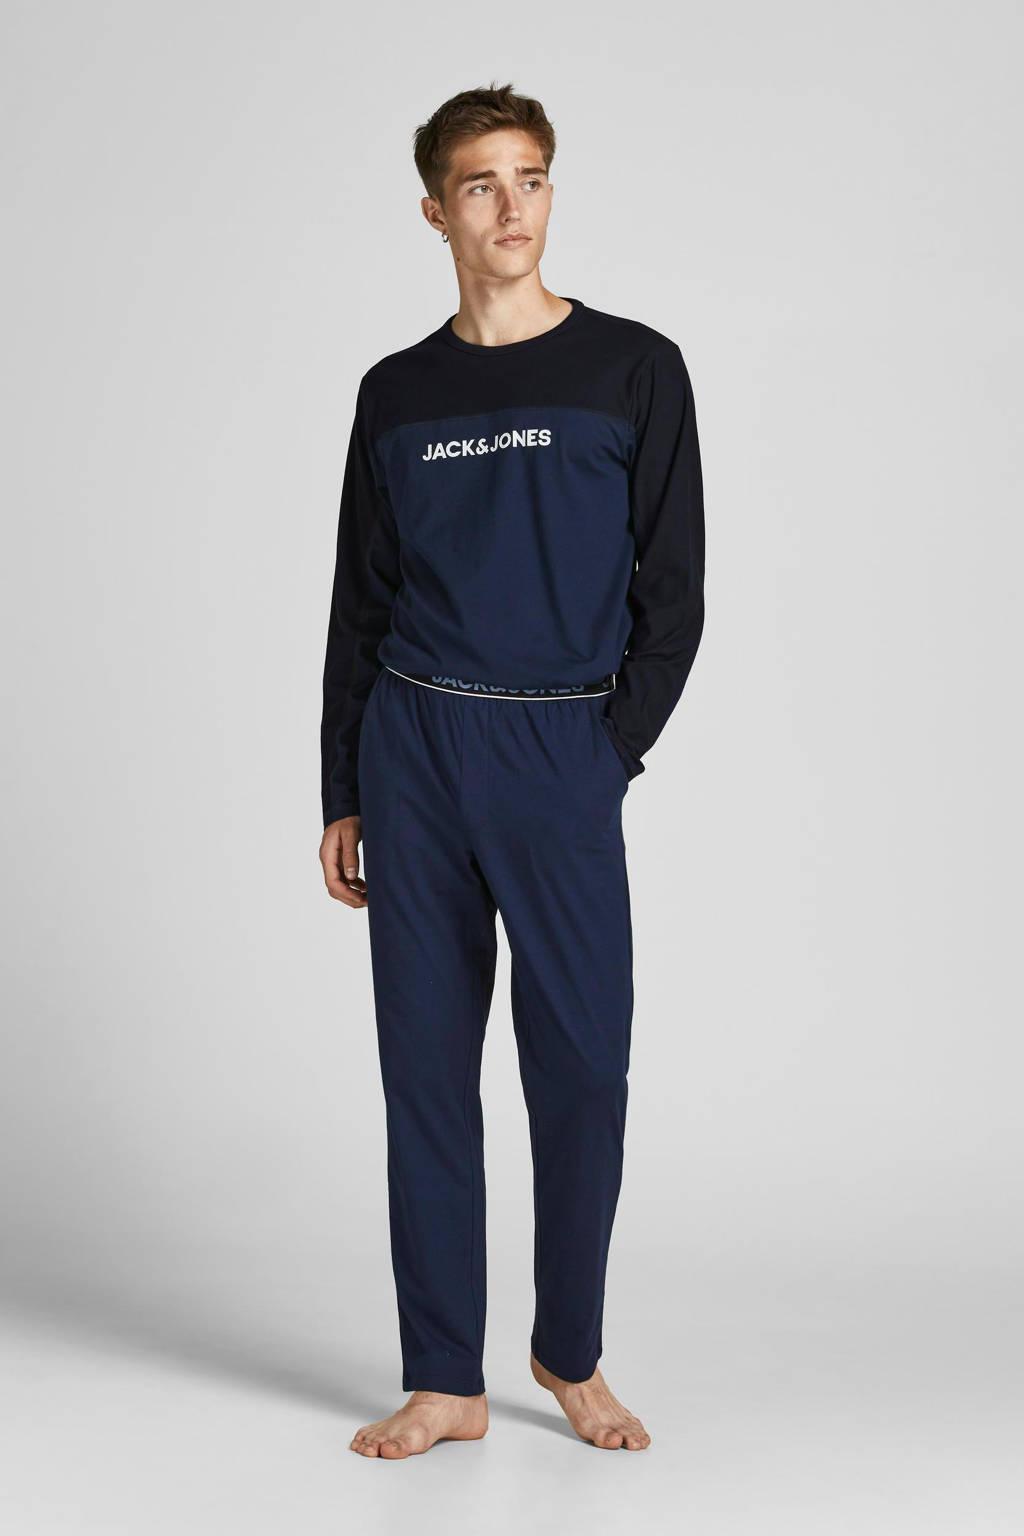 JACK & JONES pyjama JACSMITH donkerblauw/zwart, Donkerblauw/zwart